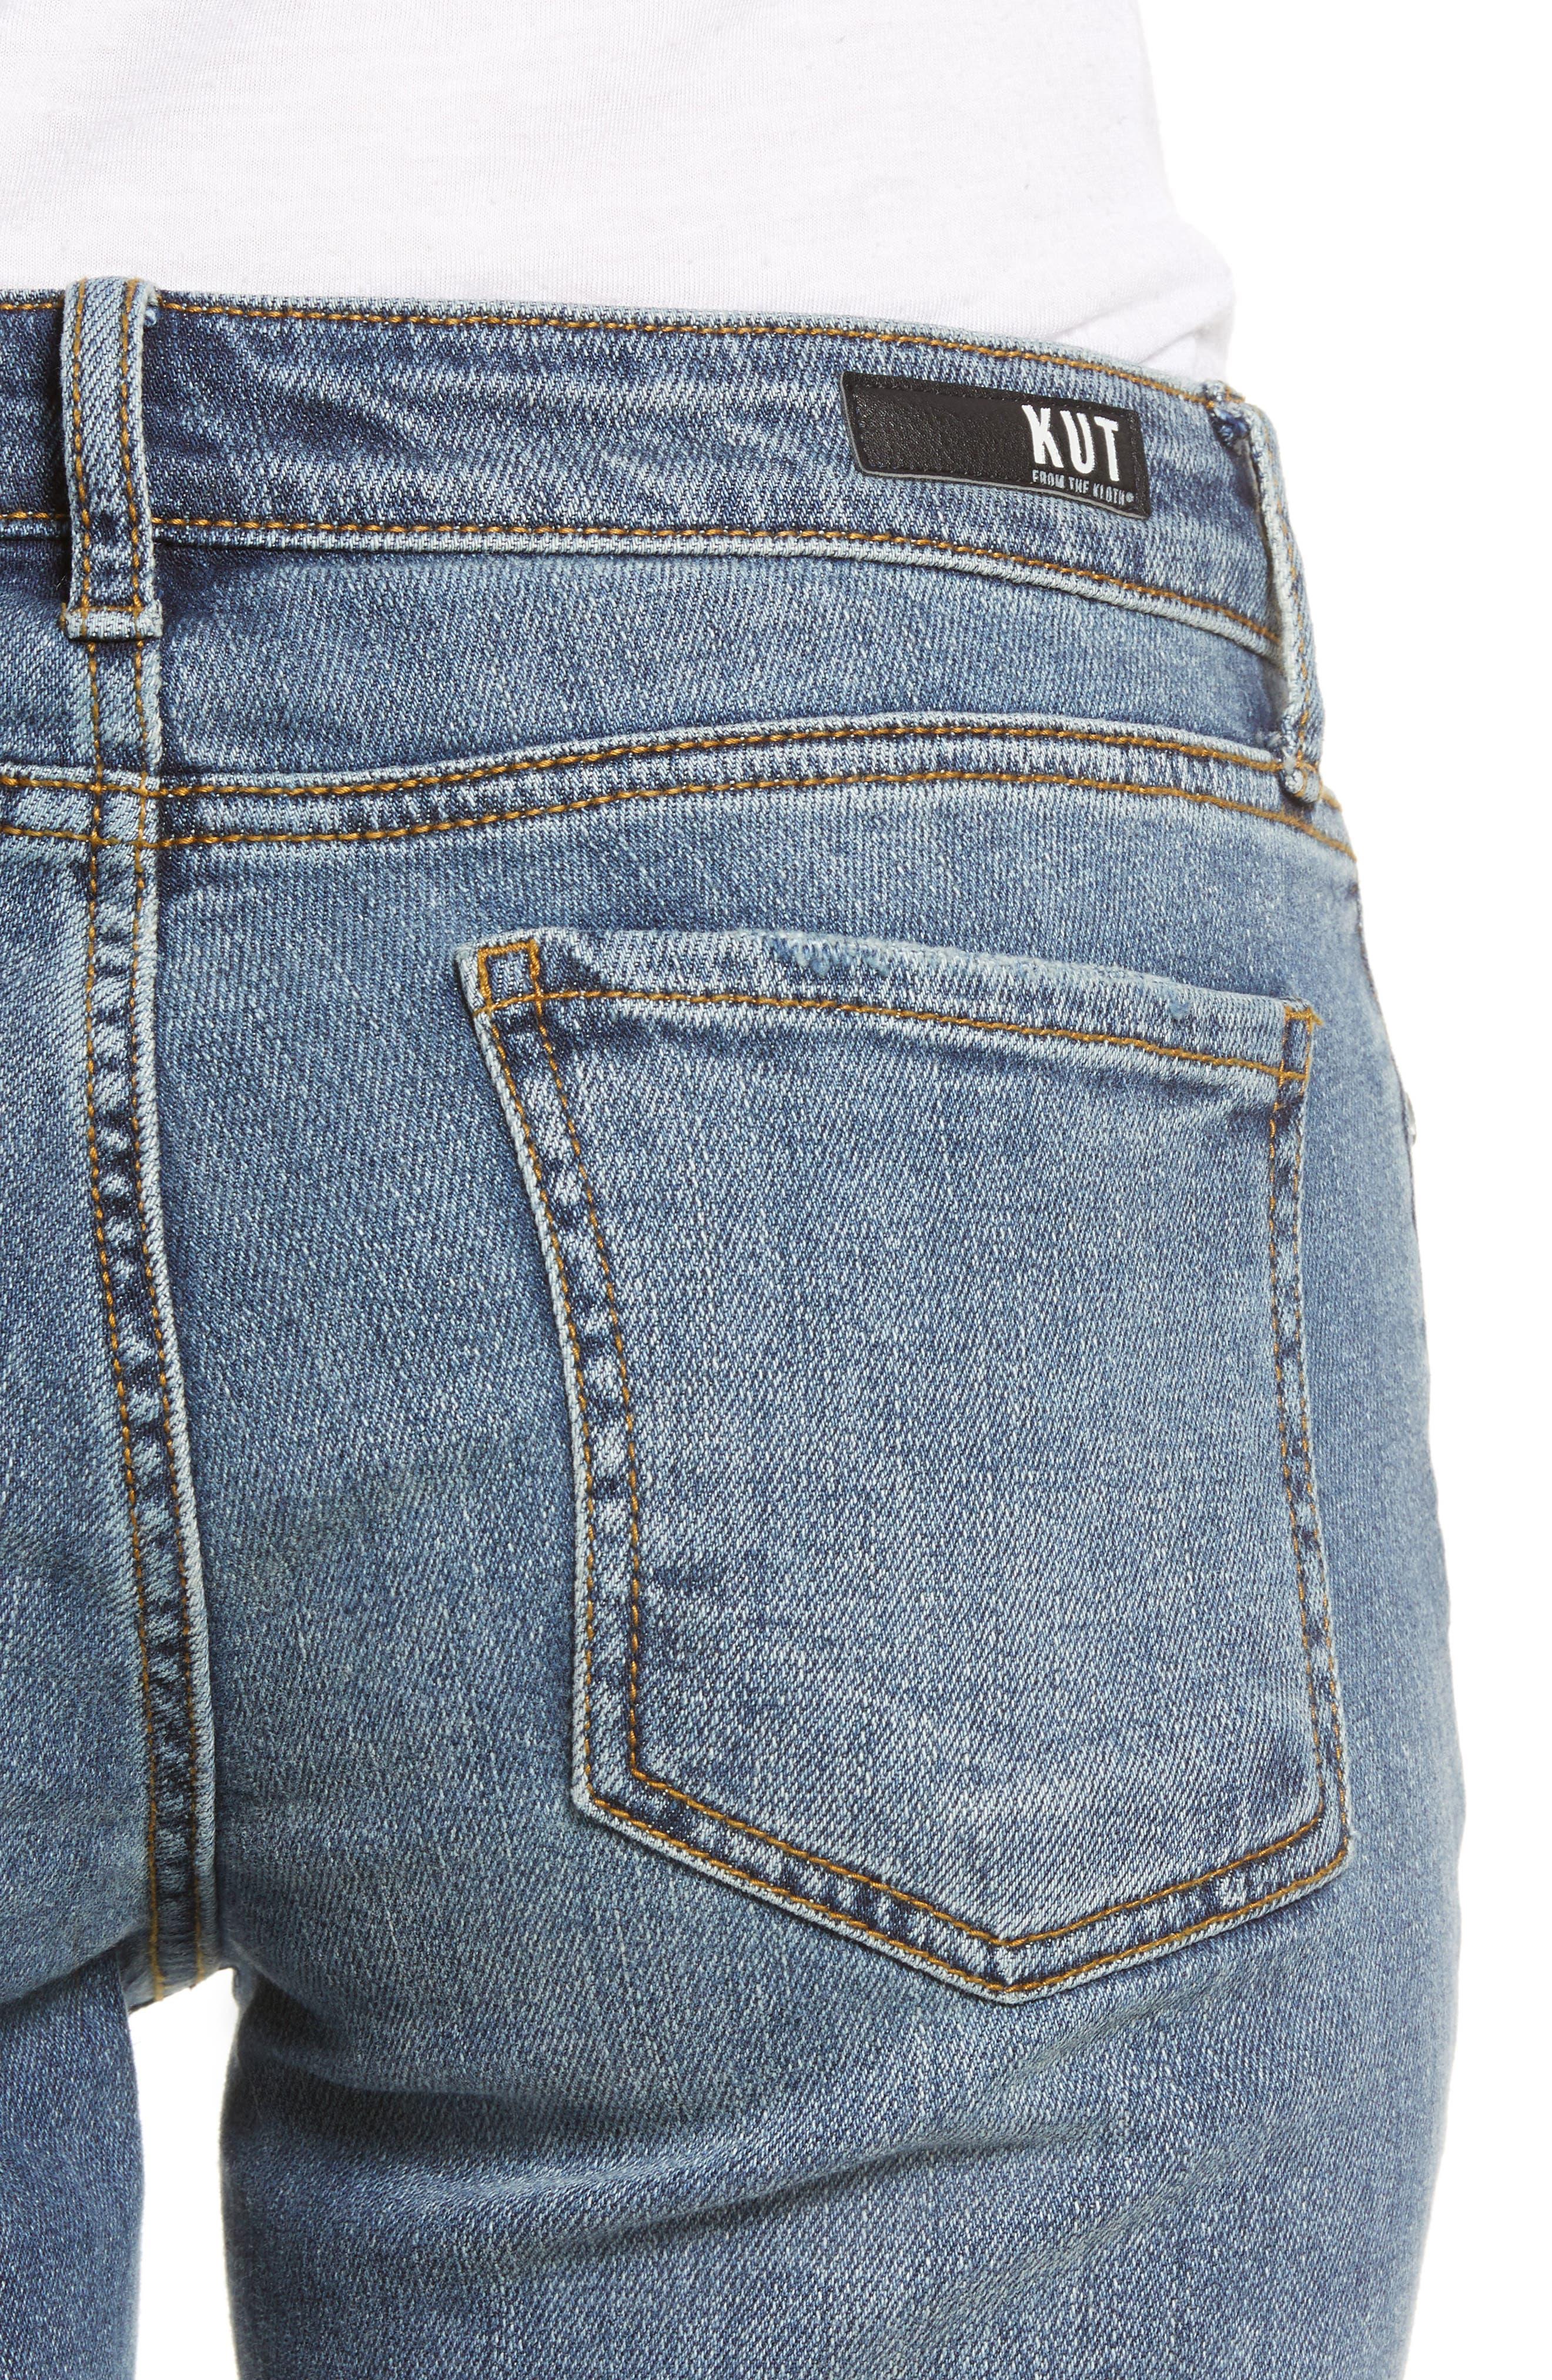 KUT FROM THE KLOTH,                             Catherine Slim Boyfriend Jeans,                             Alternate thumbnail 4, color,                             VERSION W/ MEDIUM BASE WASH